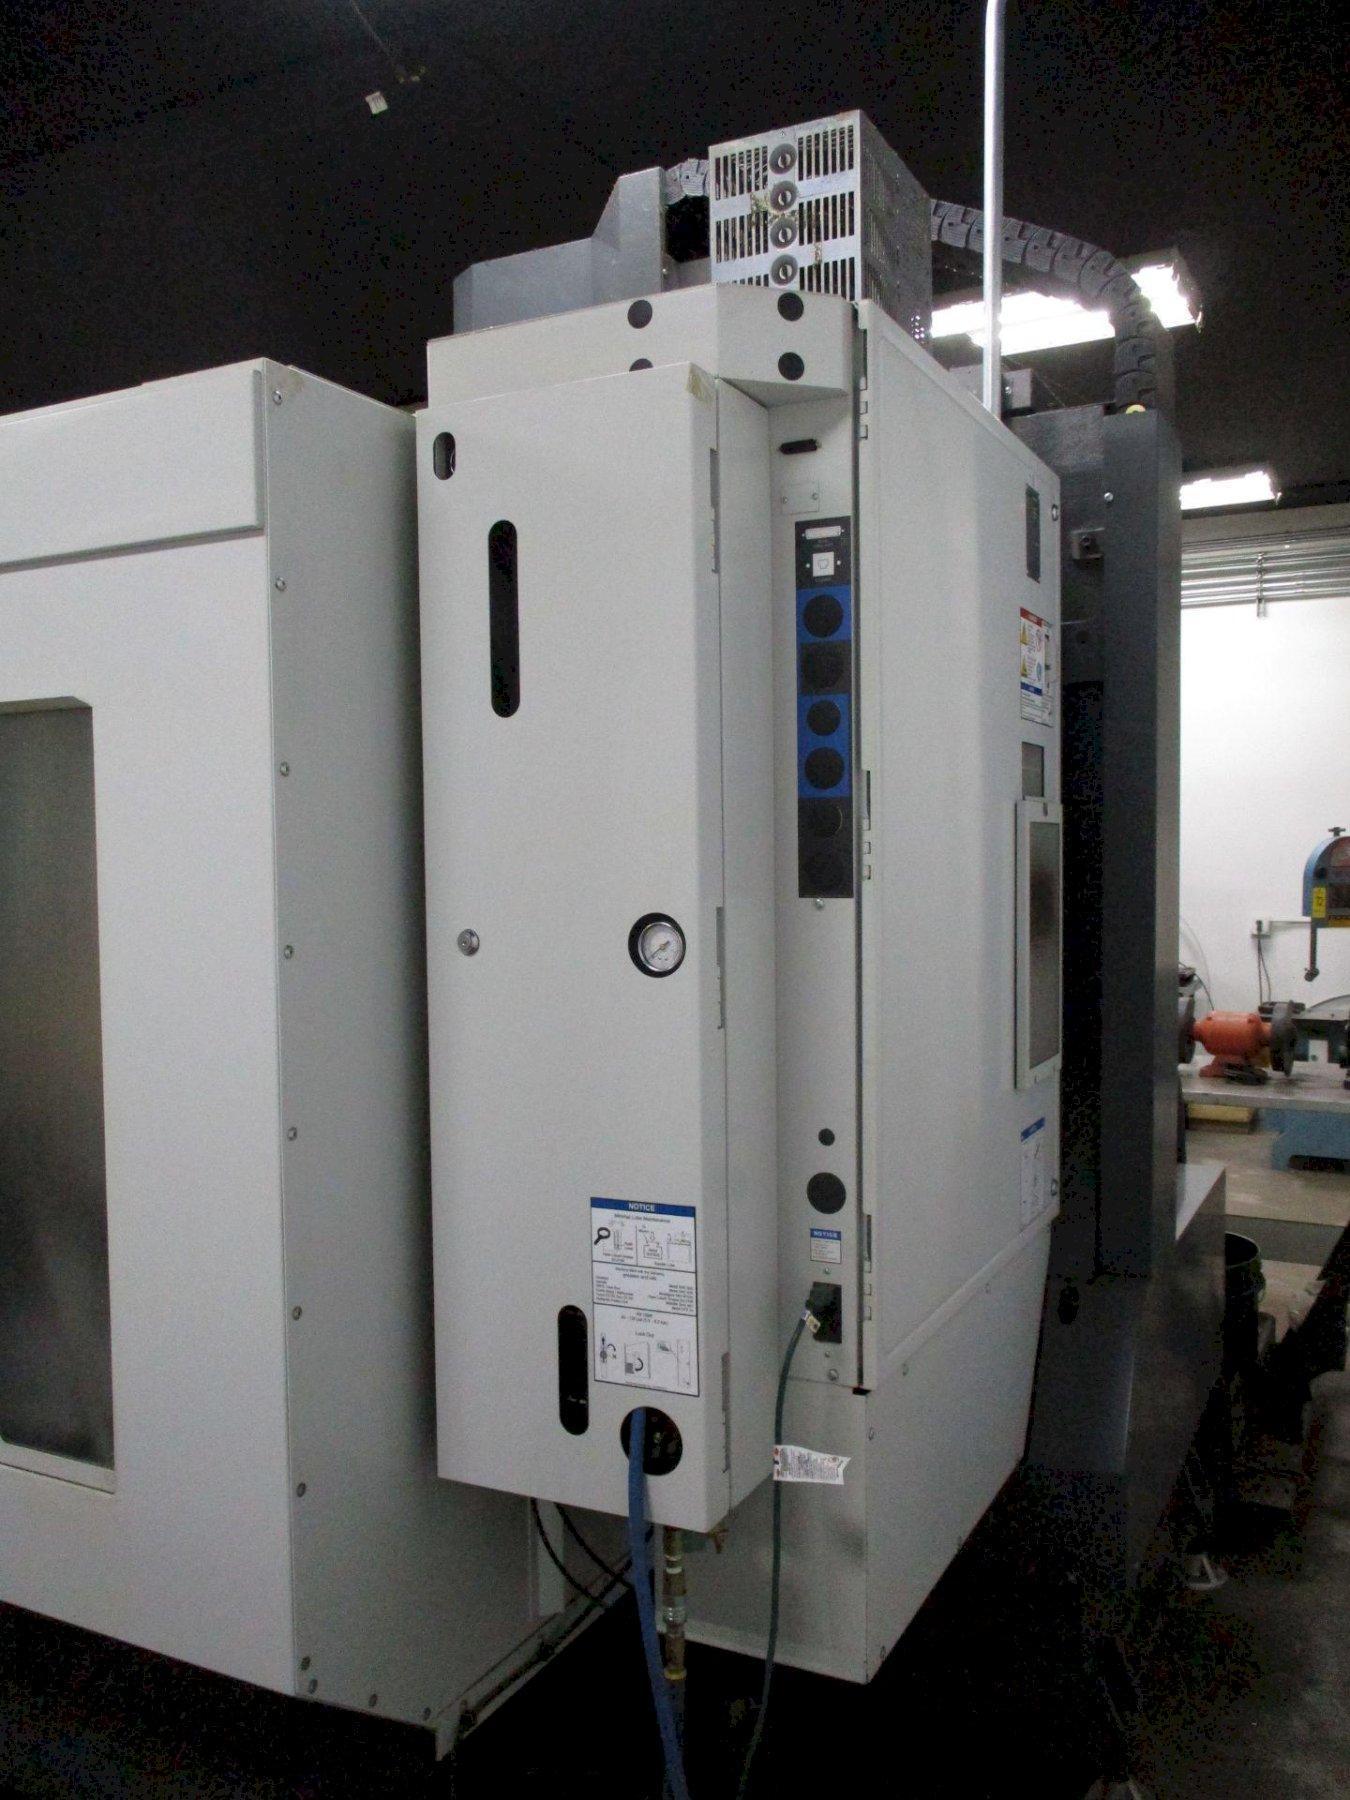 Haas VF-5 Vertical Machining Center 2015